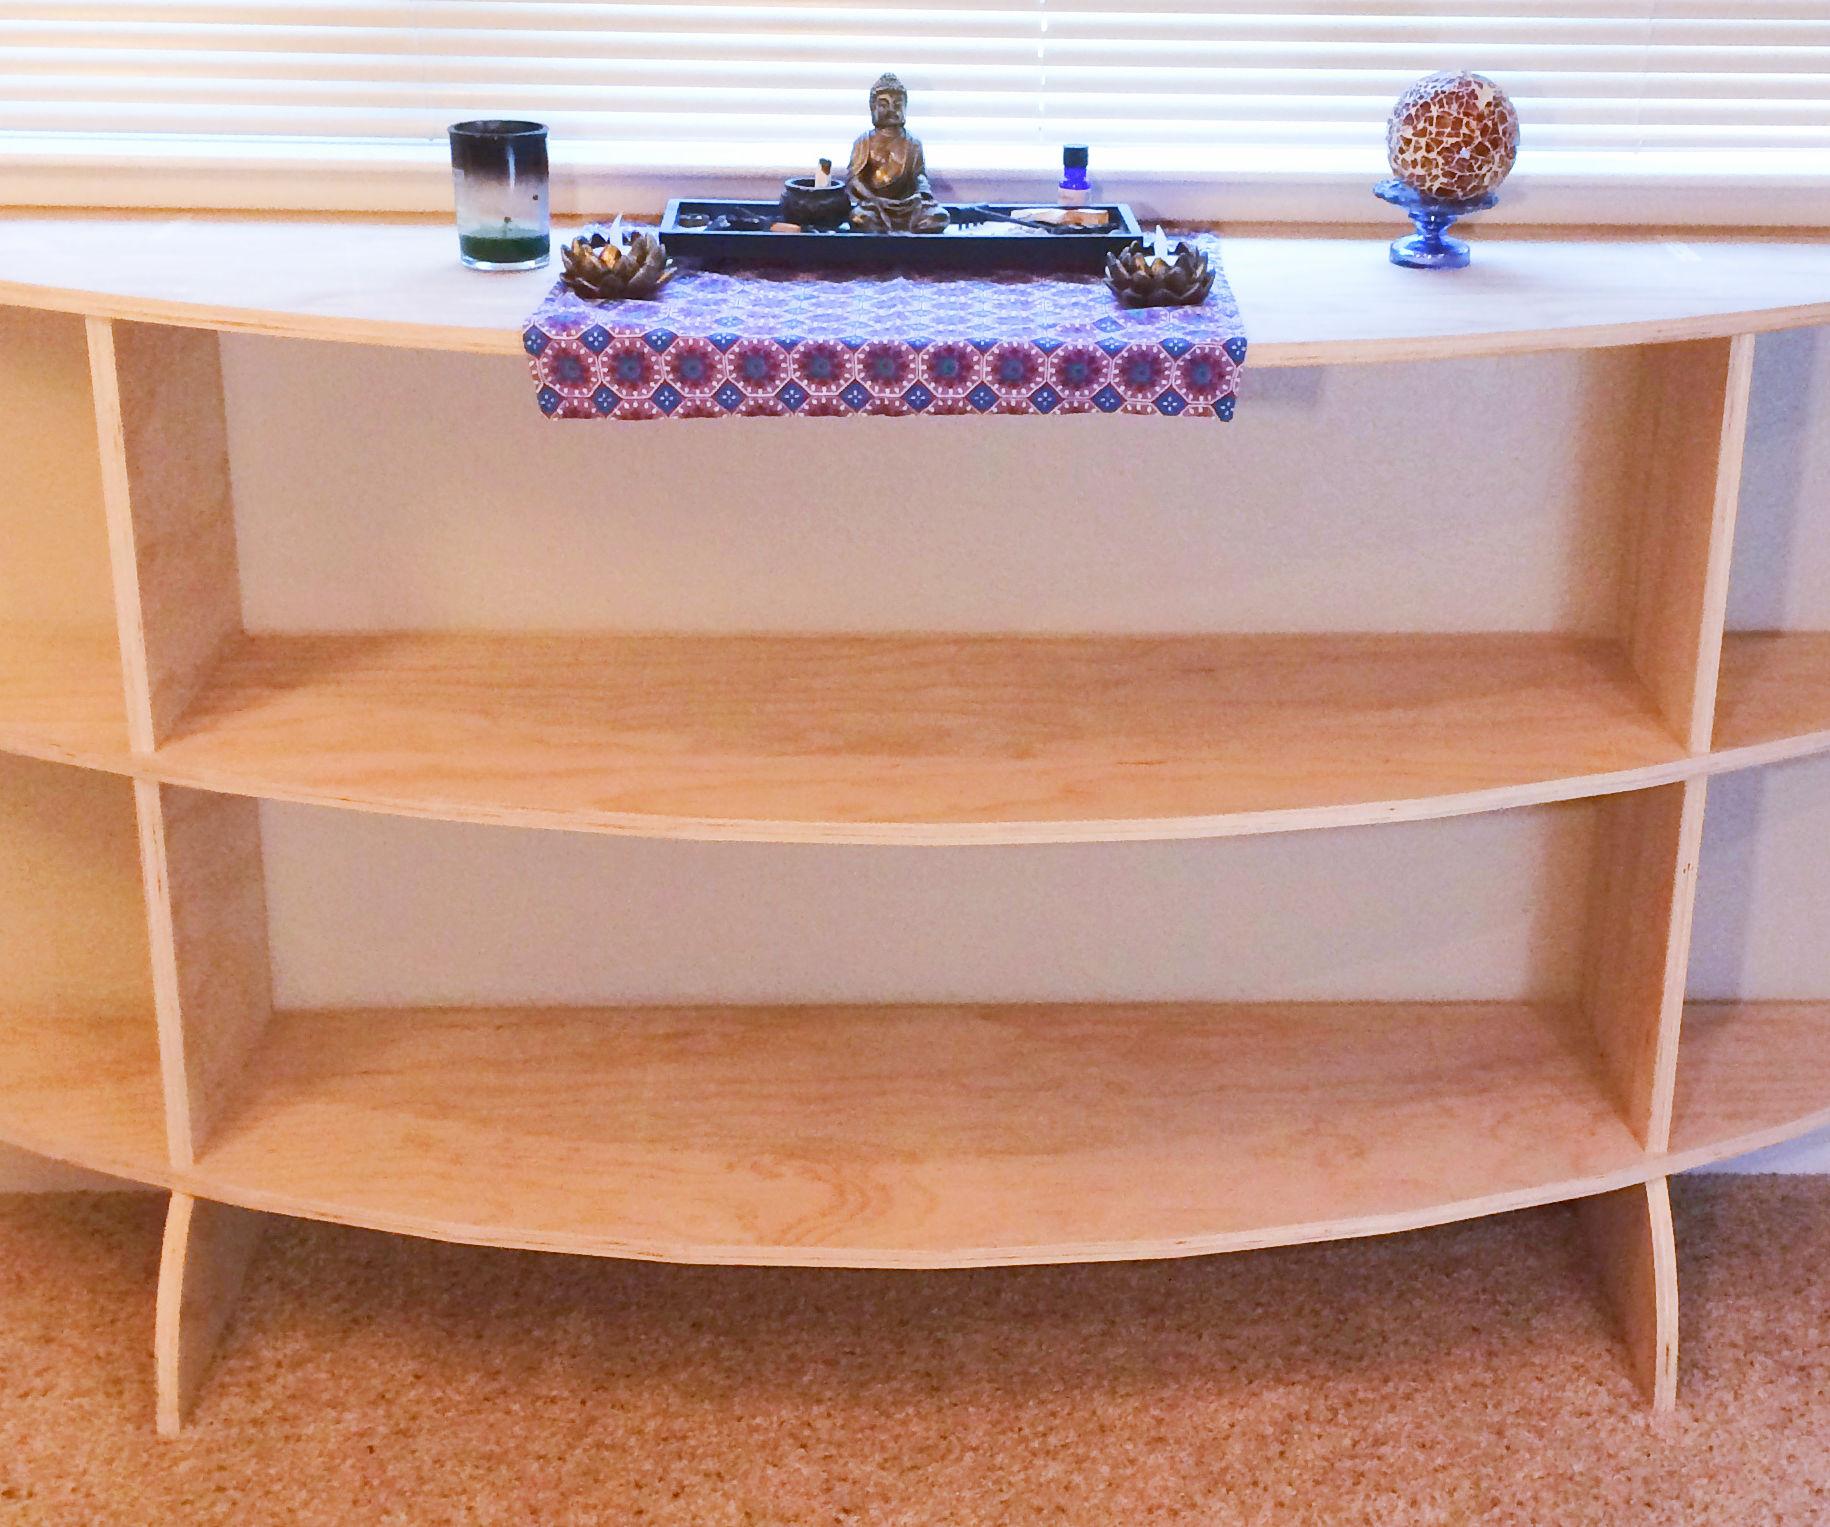 LuxO's Super EZ Half Moon Shelf